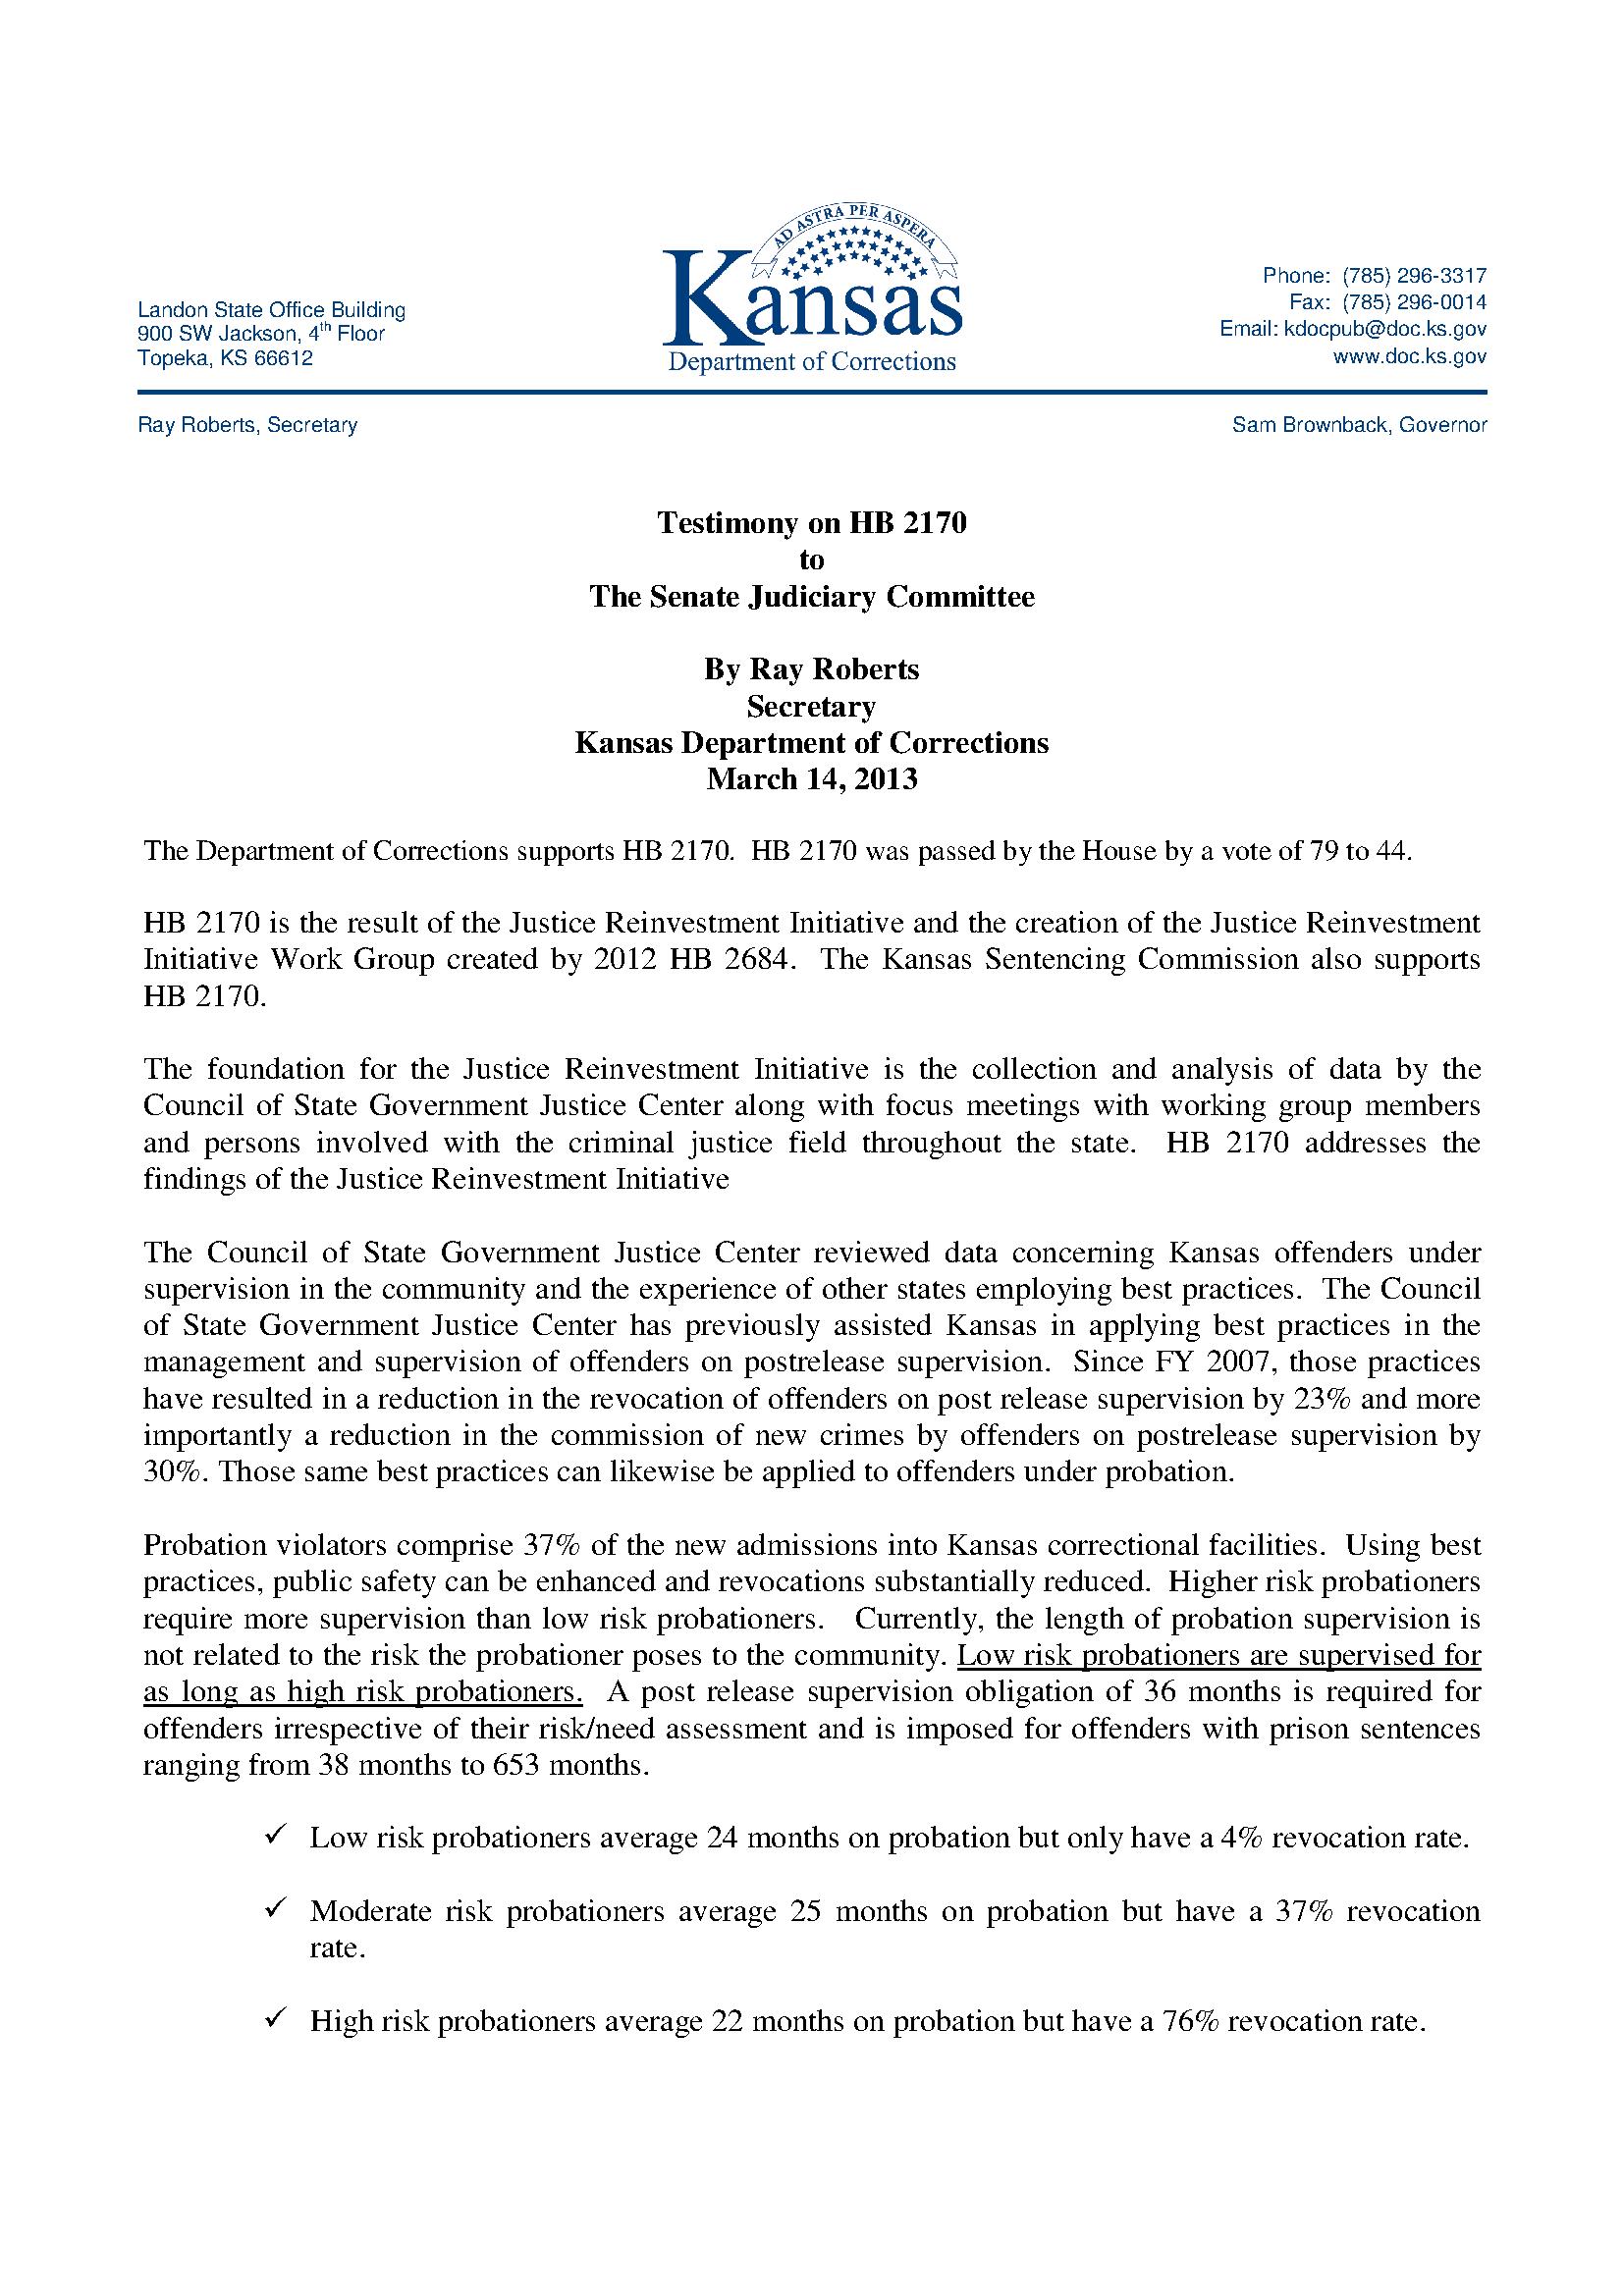 Testimony on HB 2170 - Kansas  Department of Corrections